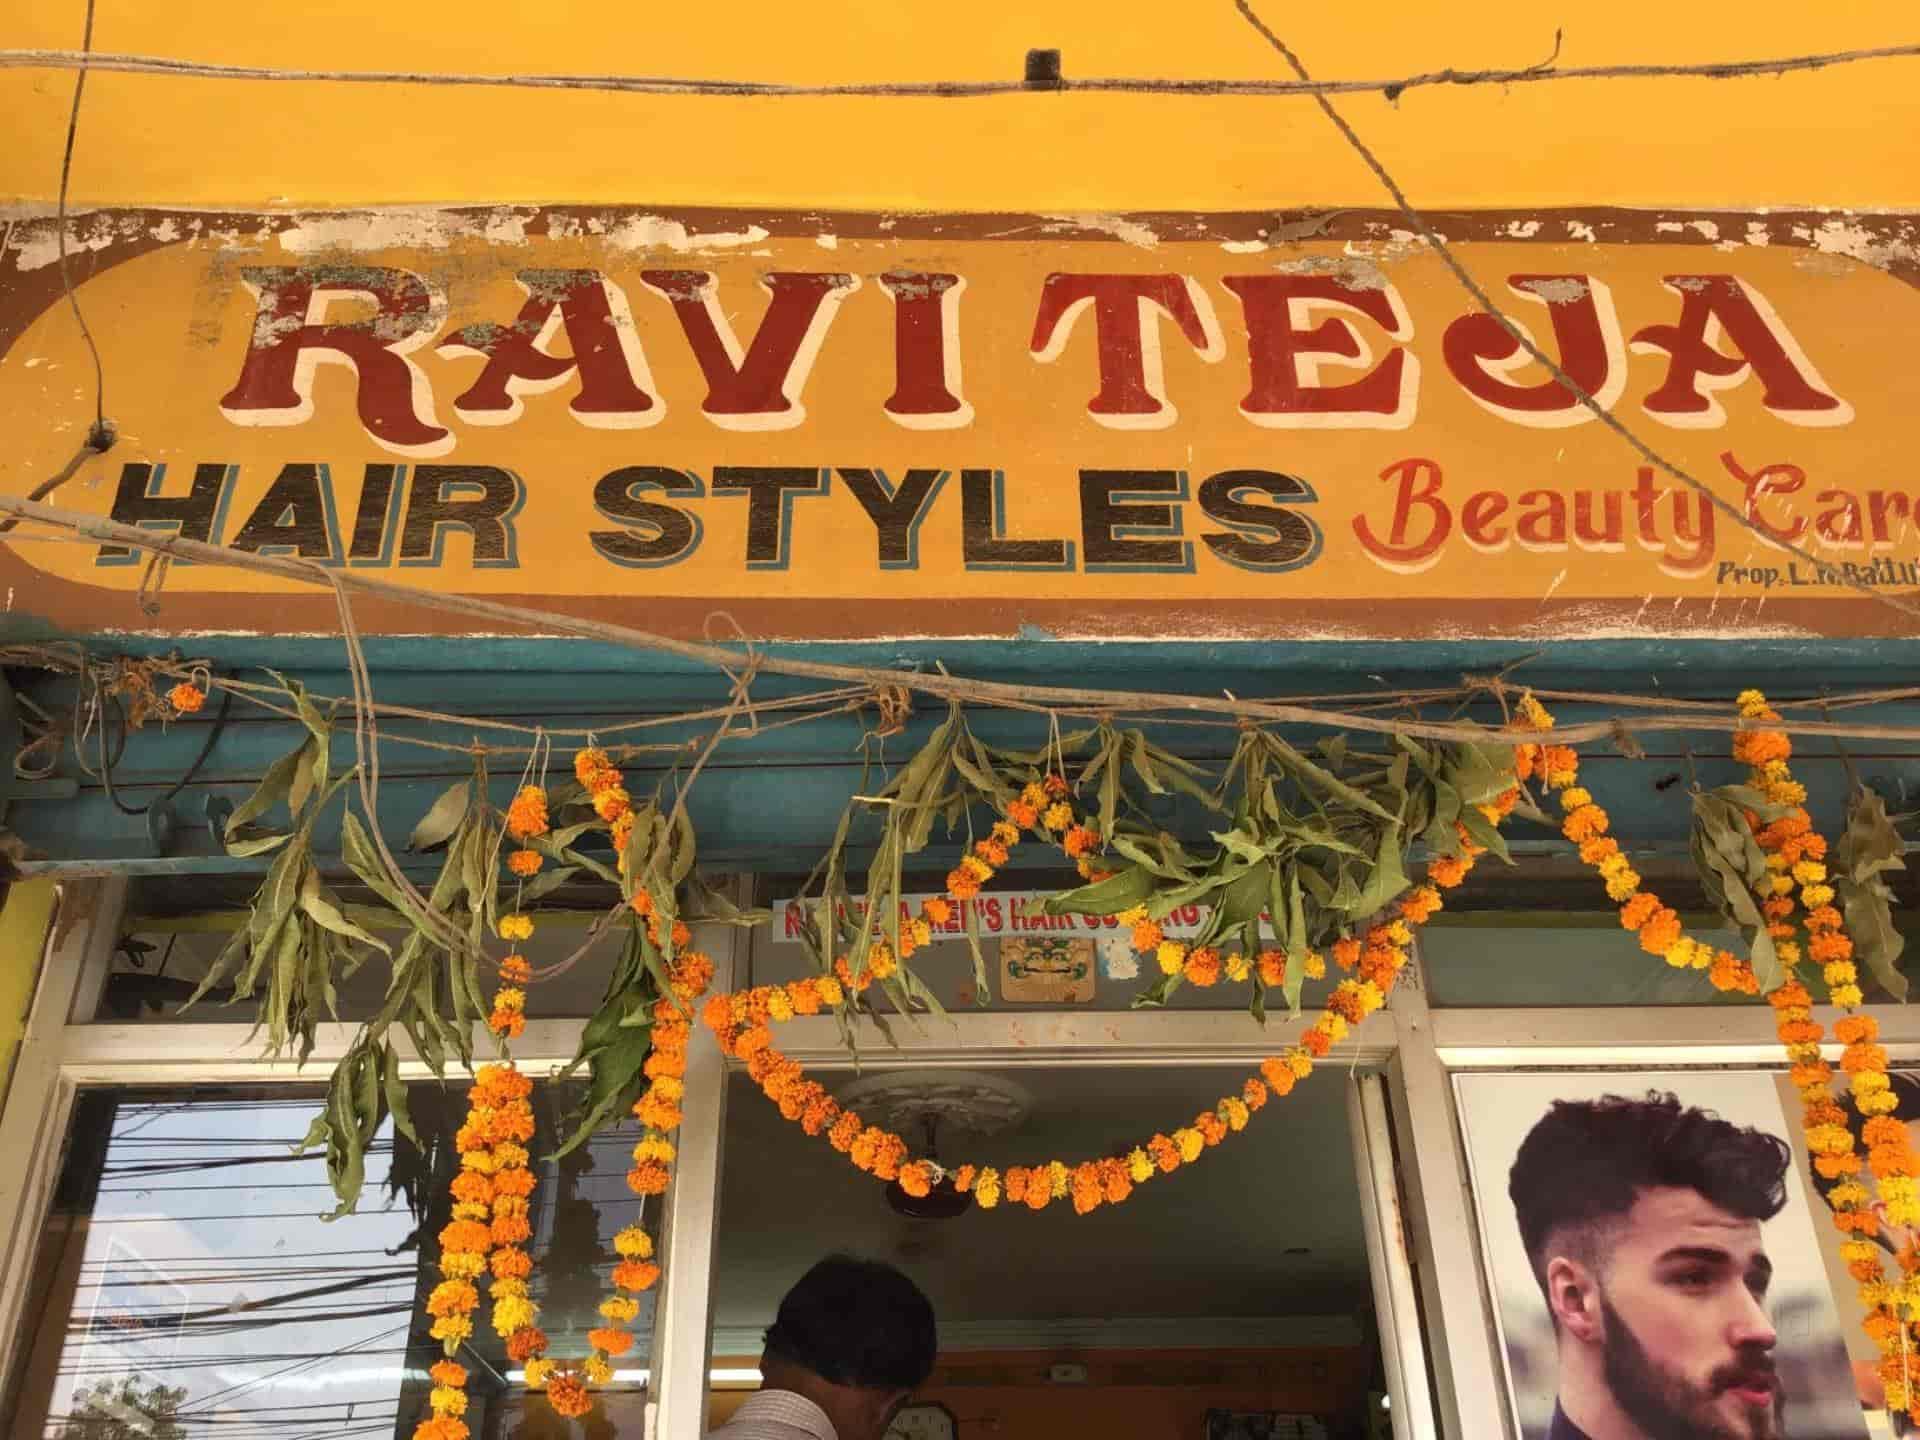 Ravi Teja Hairstyles Beauty Care, Hasmathpet - Salons in